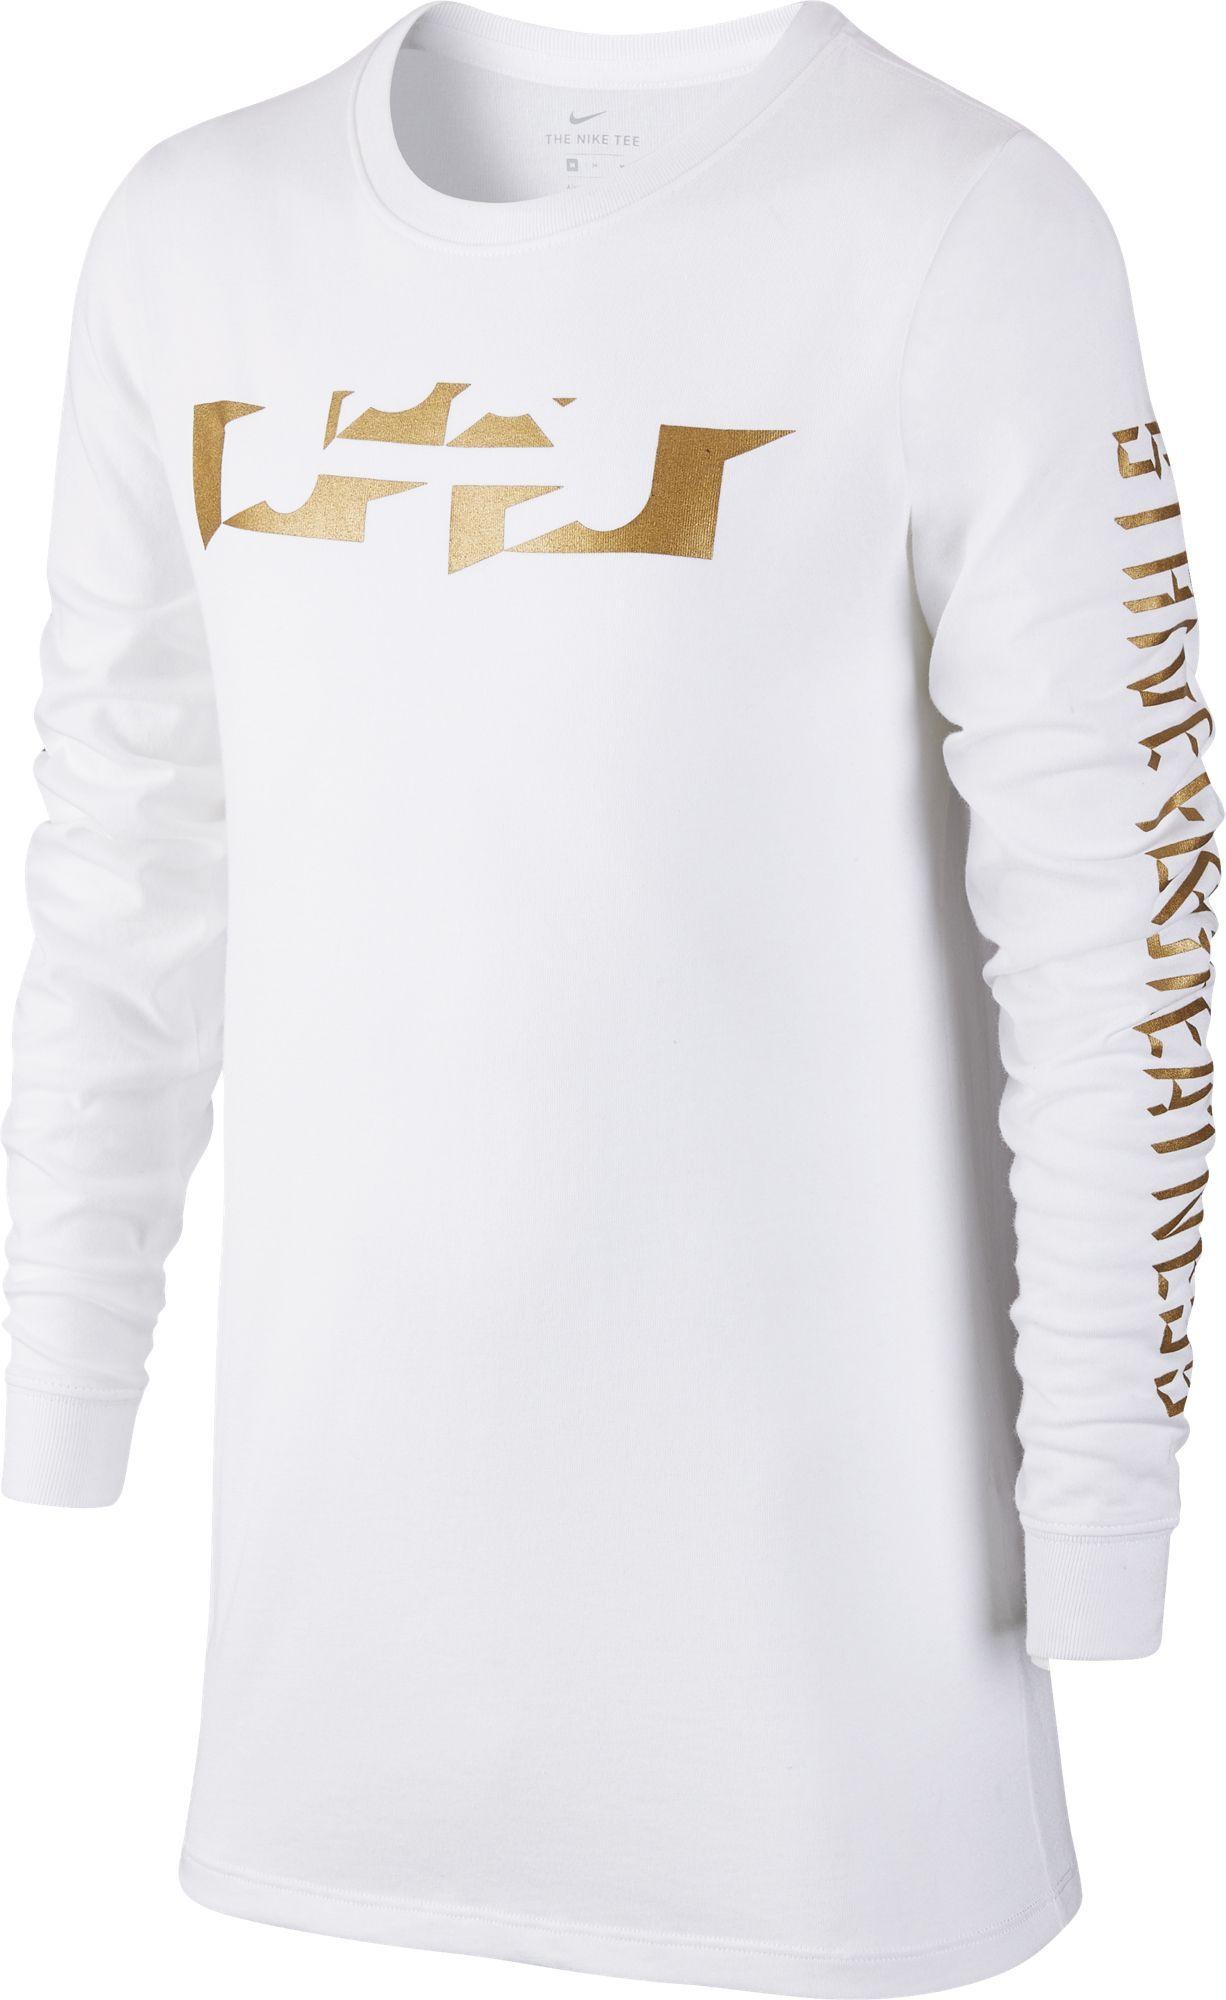 Nike Boys Dry Lebron Long Sleeve T Shirt White Size X Large Boy S Apparel Boy S Athletic Tops At Academy Spor Lebron James T Shirt Nike Dri Fit Big Boys [ 2000 x 1226 Pixel ]